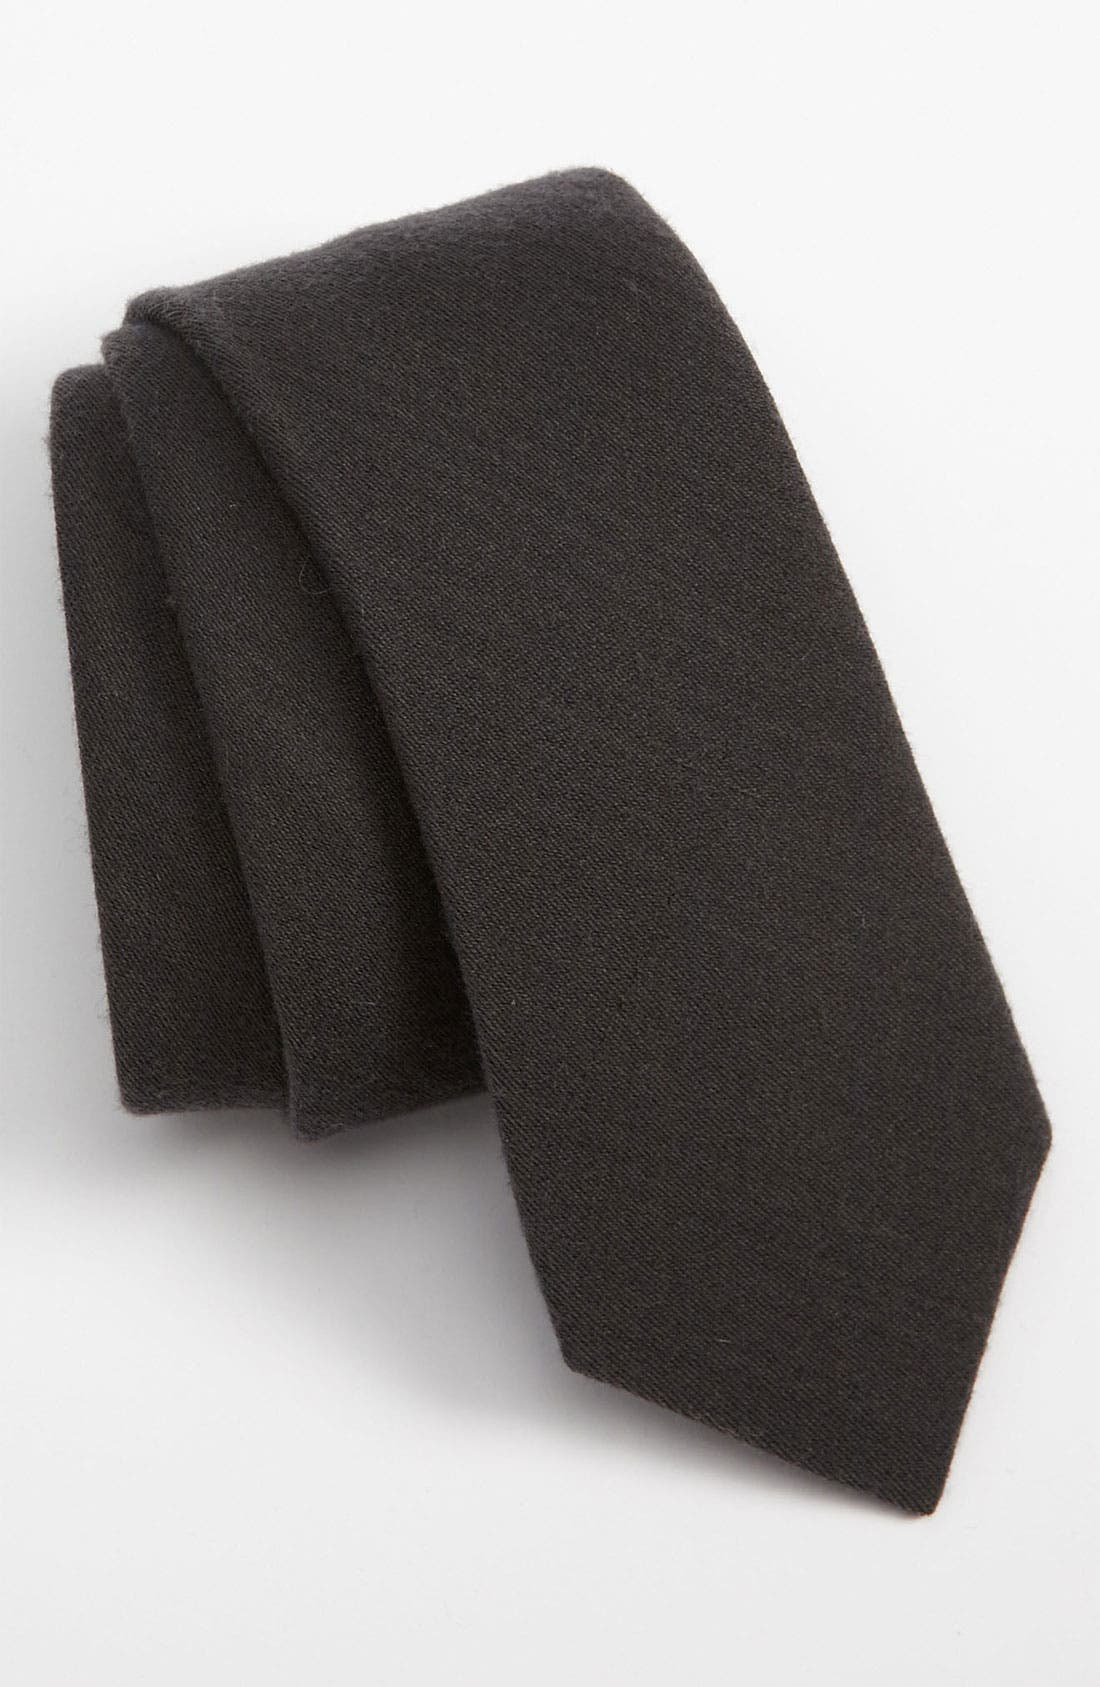 Alternate Image 1 Selected - The Tie Bar Solid Wool Blend Skinny Tie (Online Only)